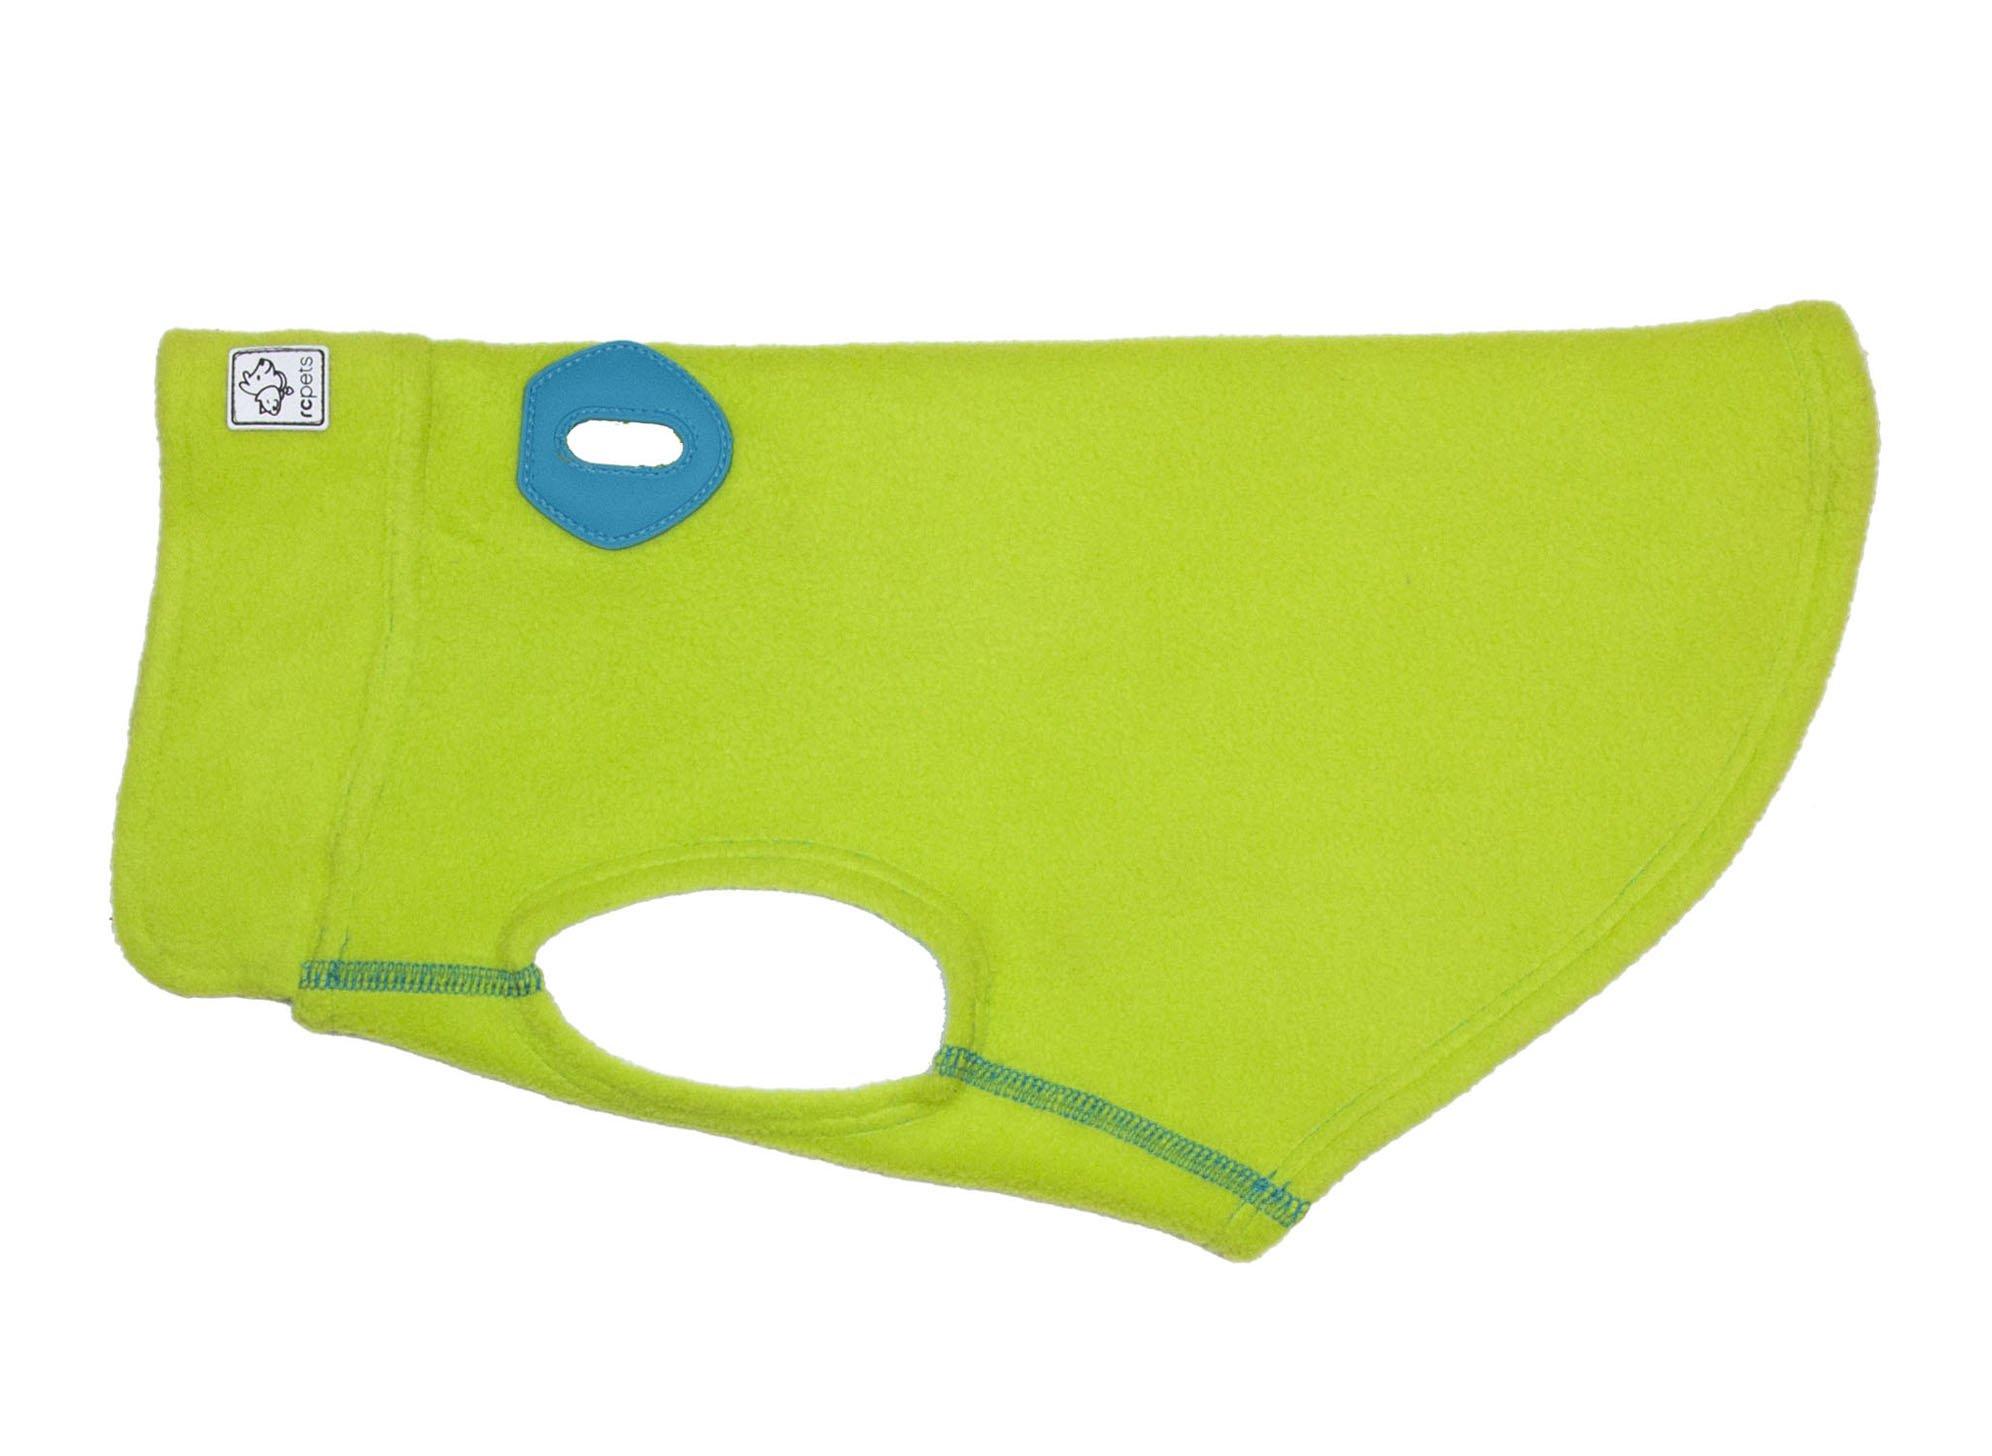 RC Pet Products Baseline Dog Fleece, Dog Coat, Size 10, Lime/Teal